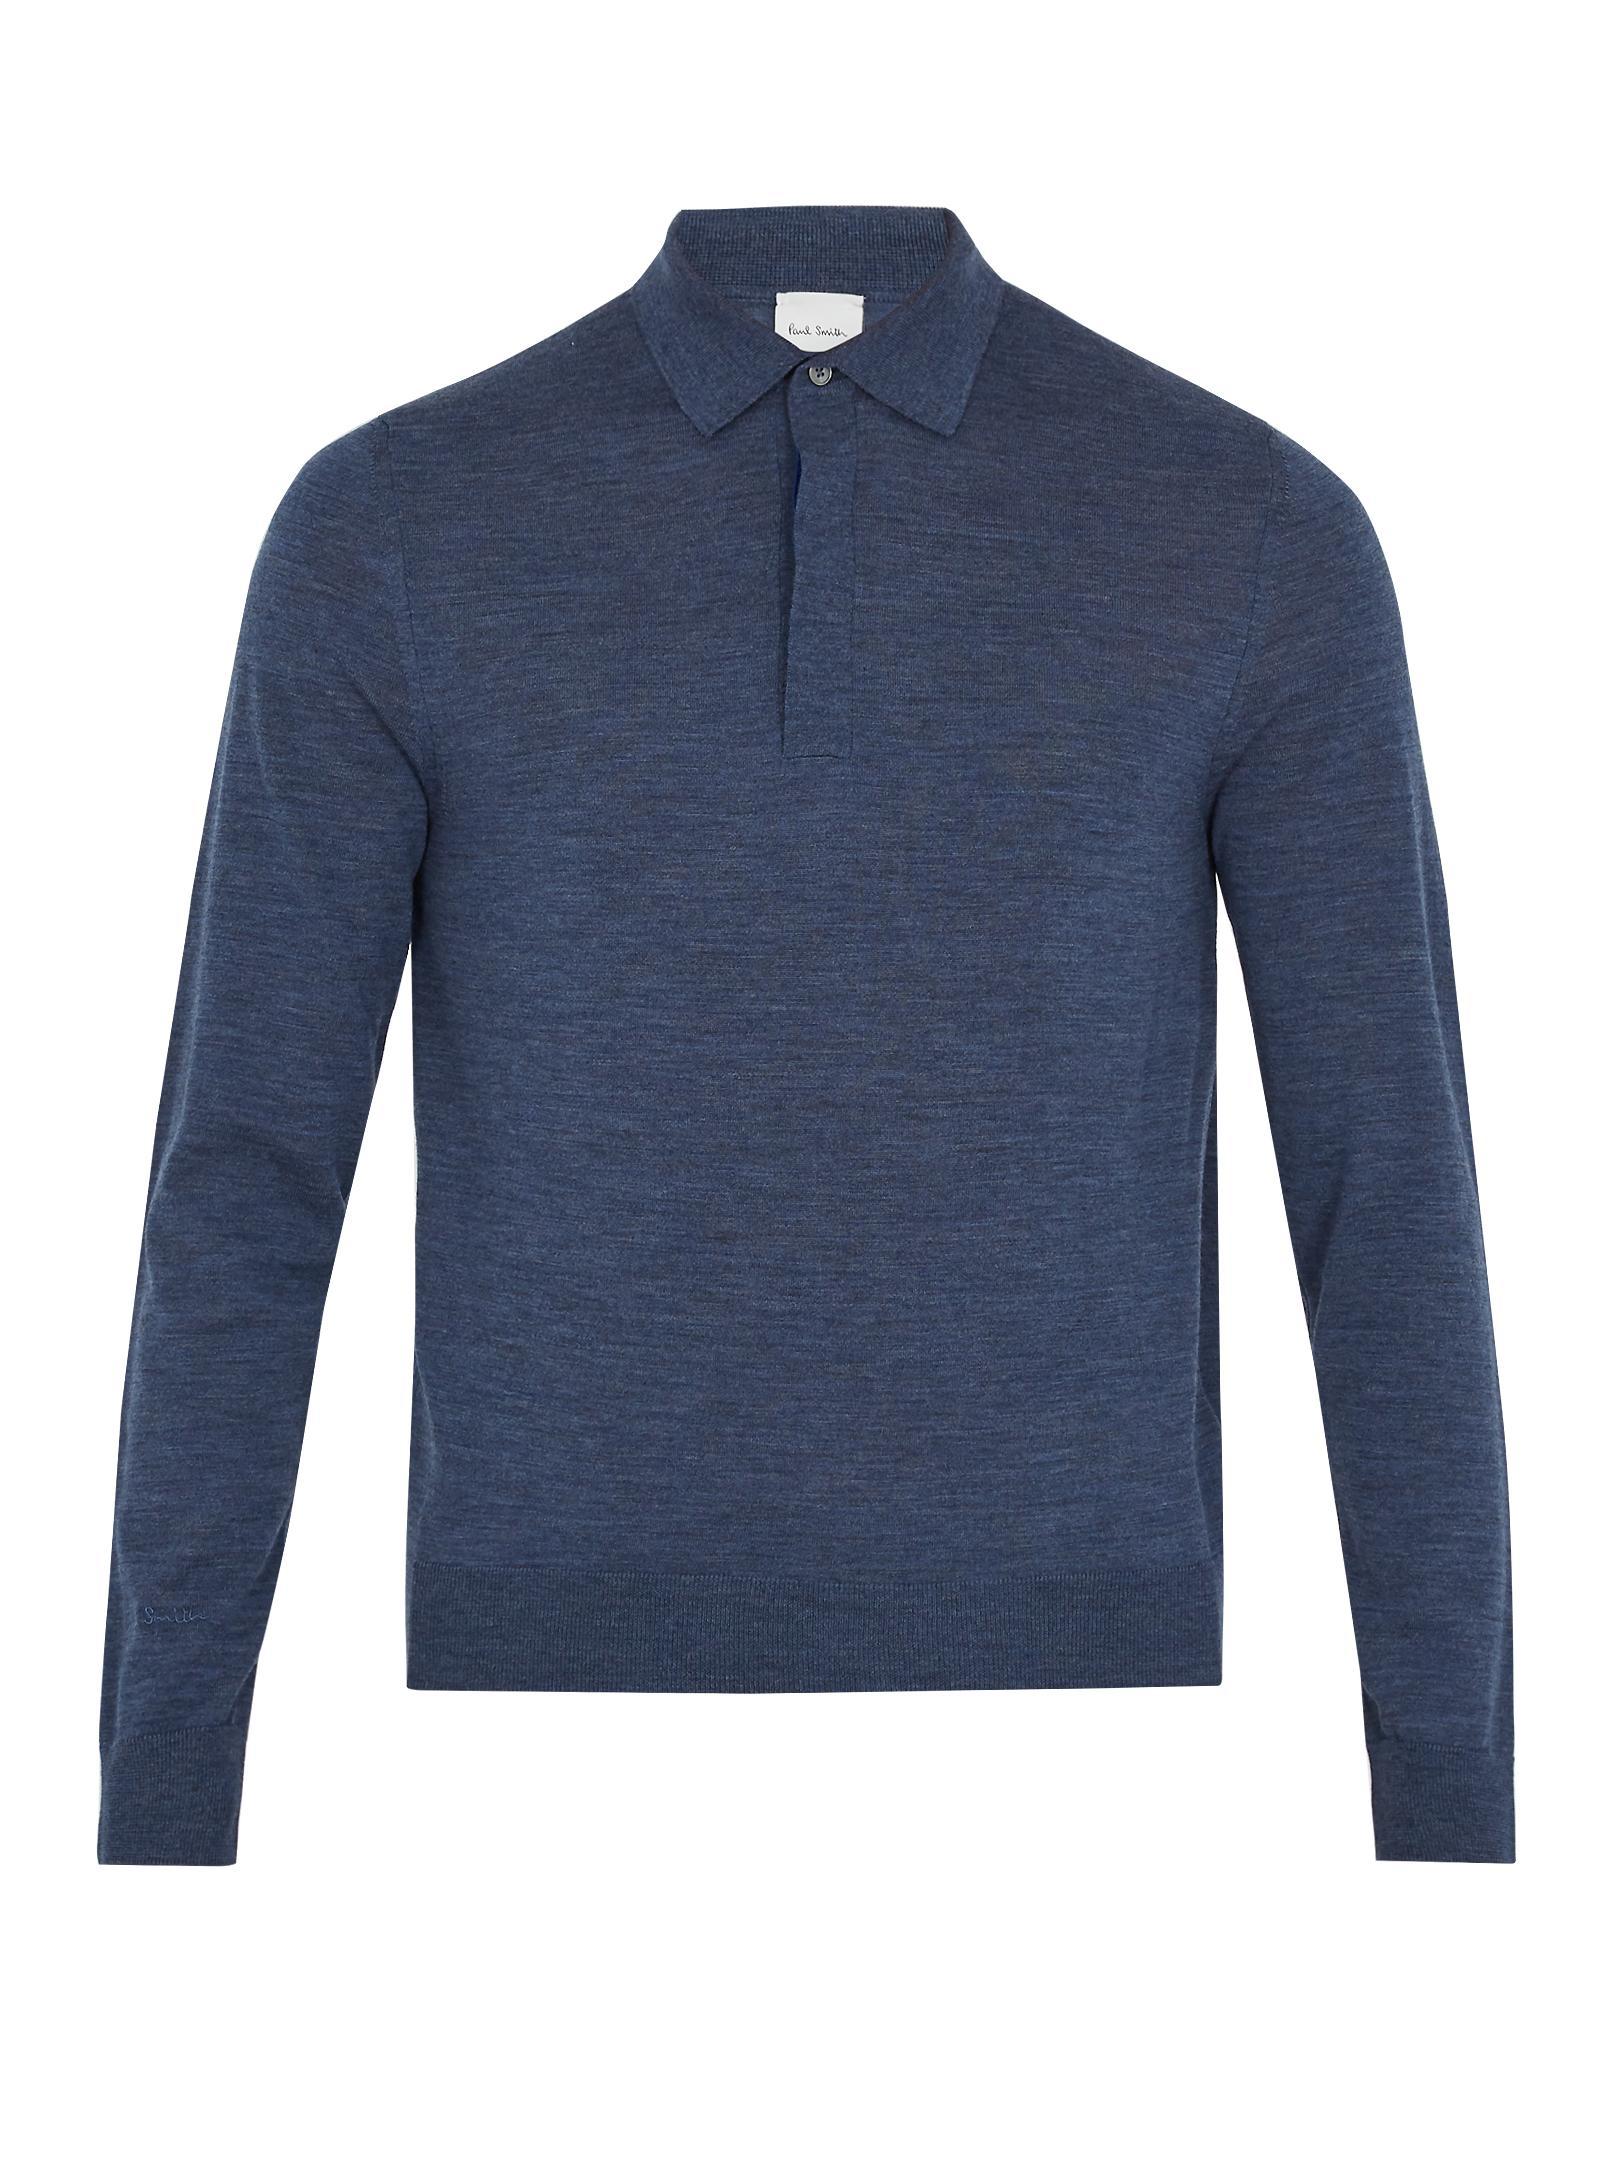 Paul smith long sleeved fine knit wool polo shirt in black for Long sleeve wool polo shirts